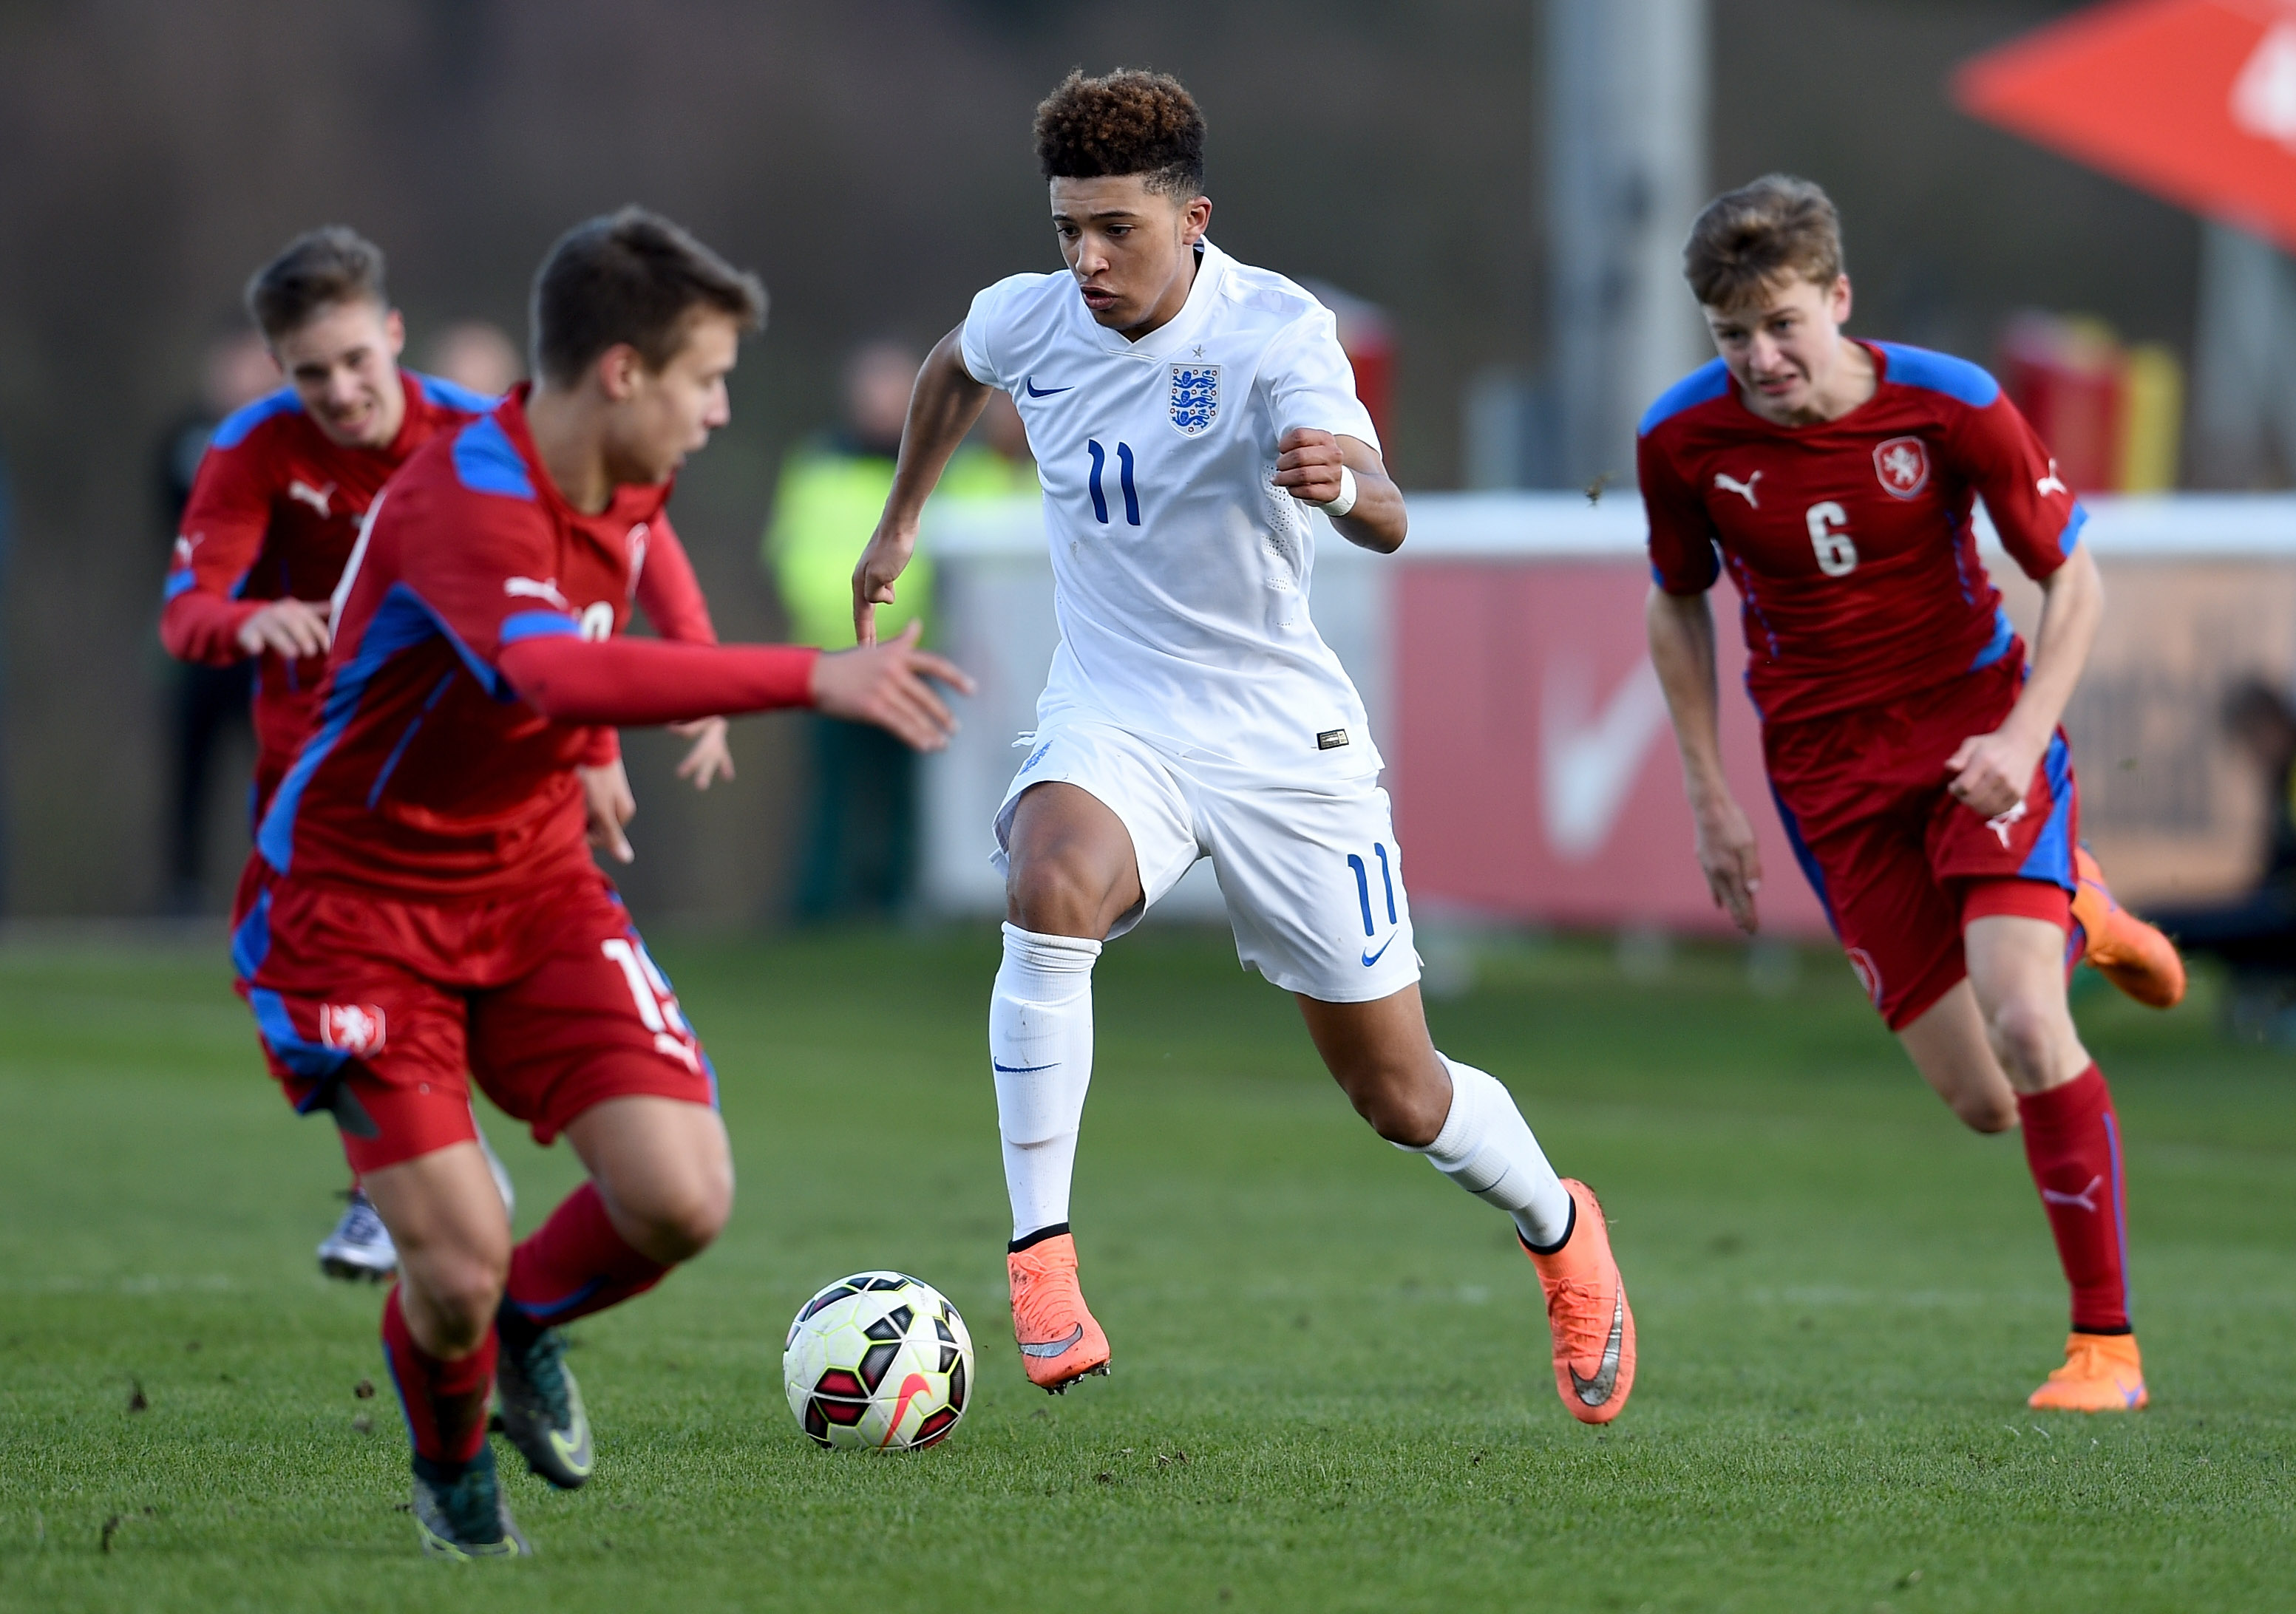 England v Czech Republic - U16s International Friendly